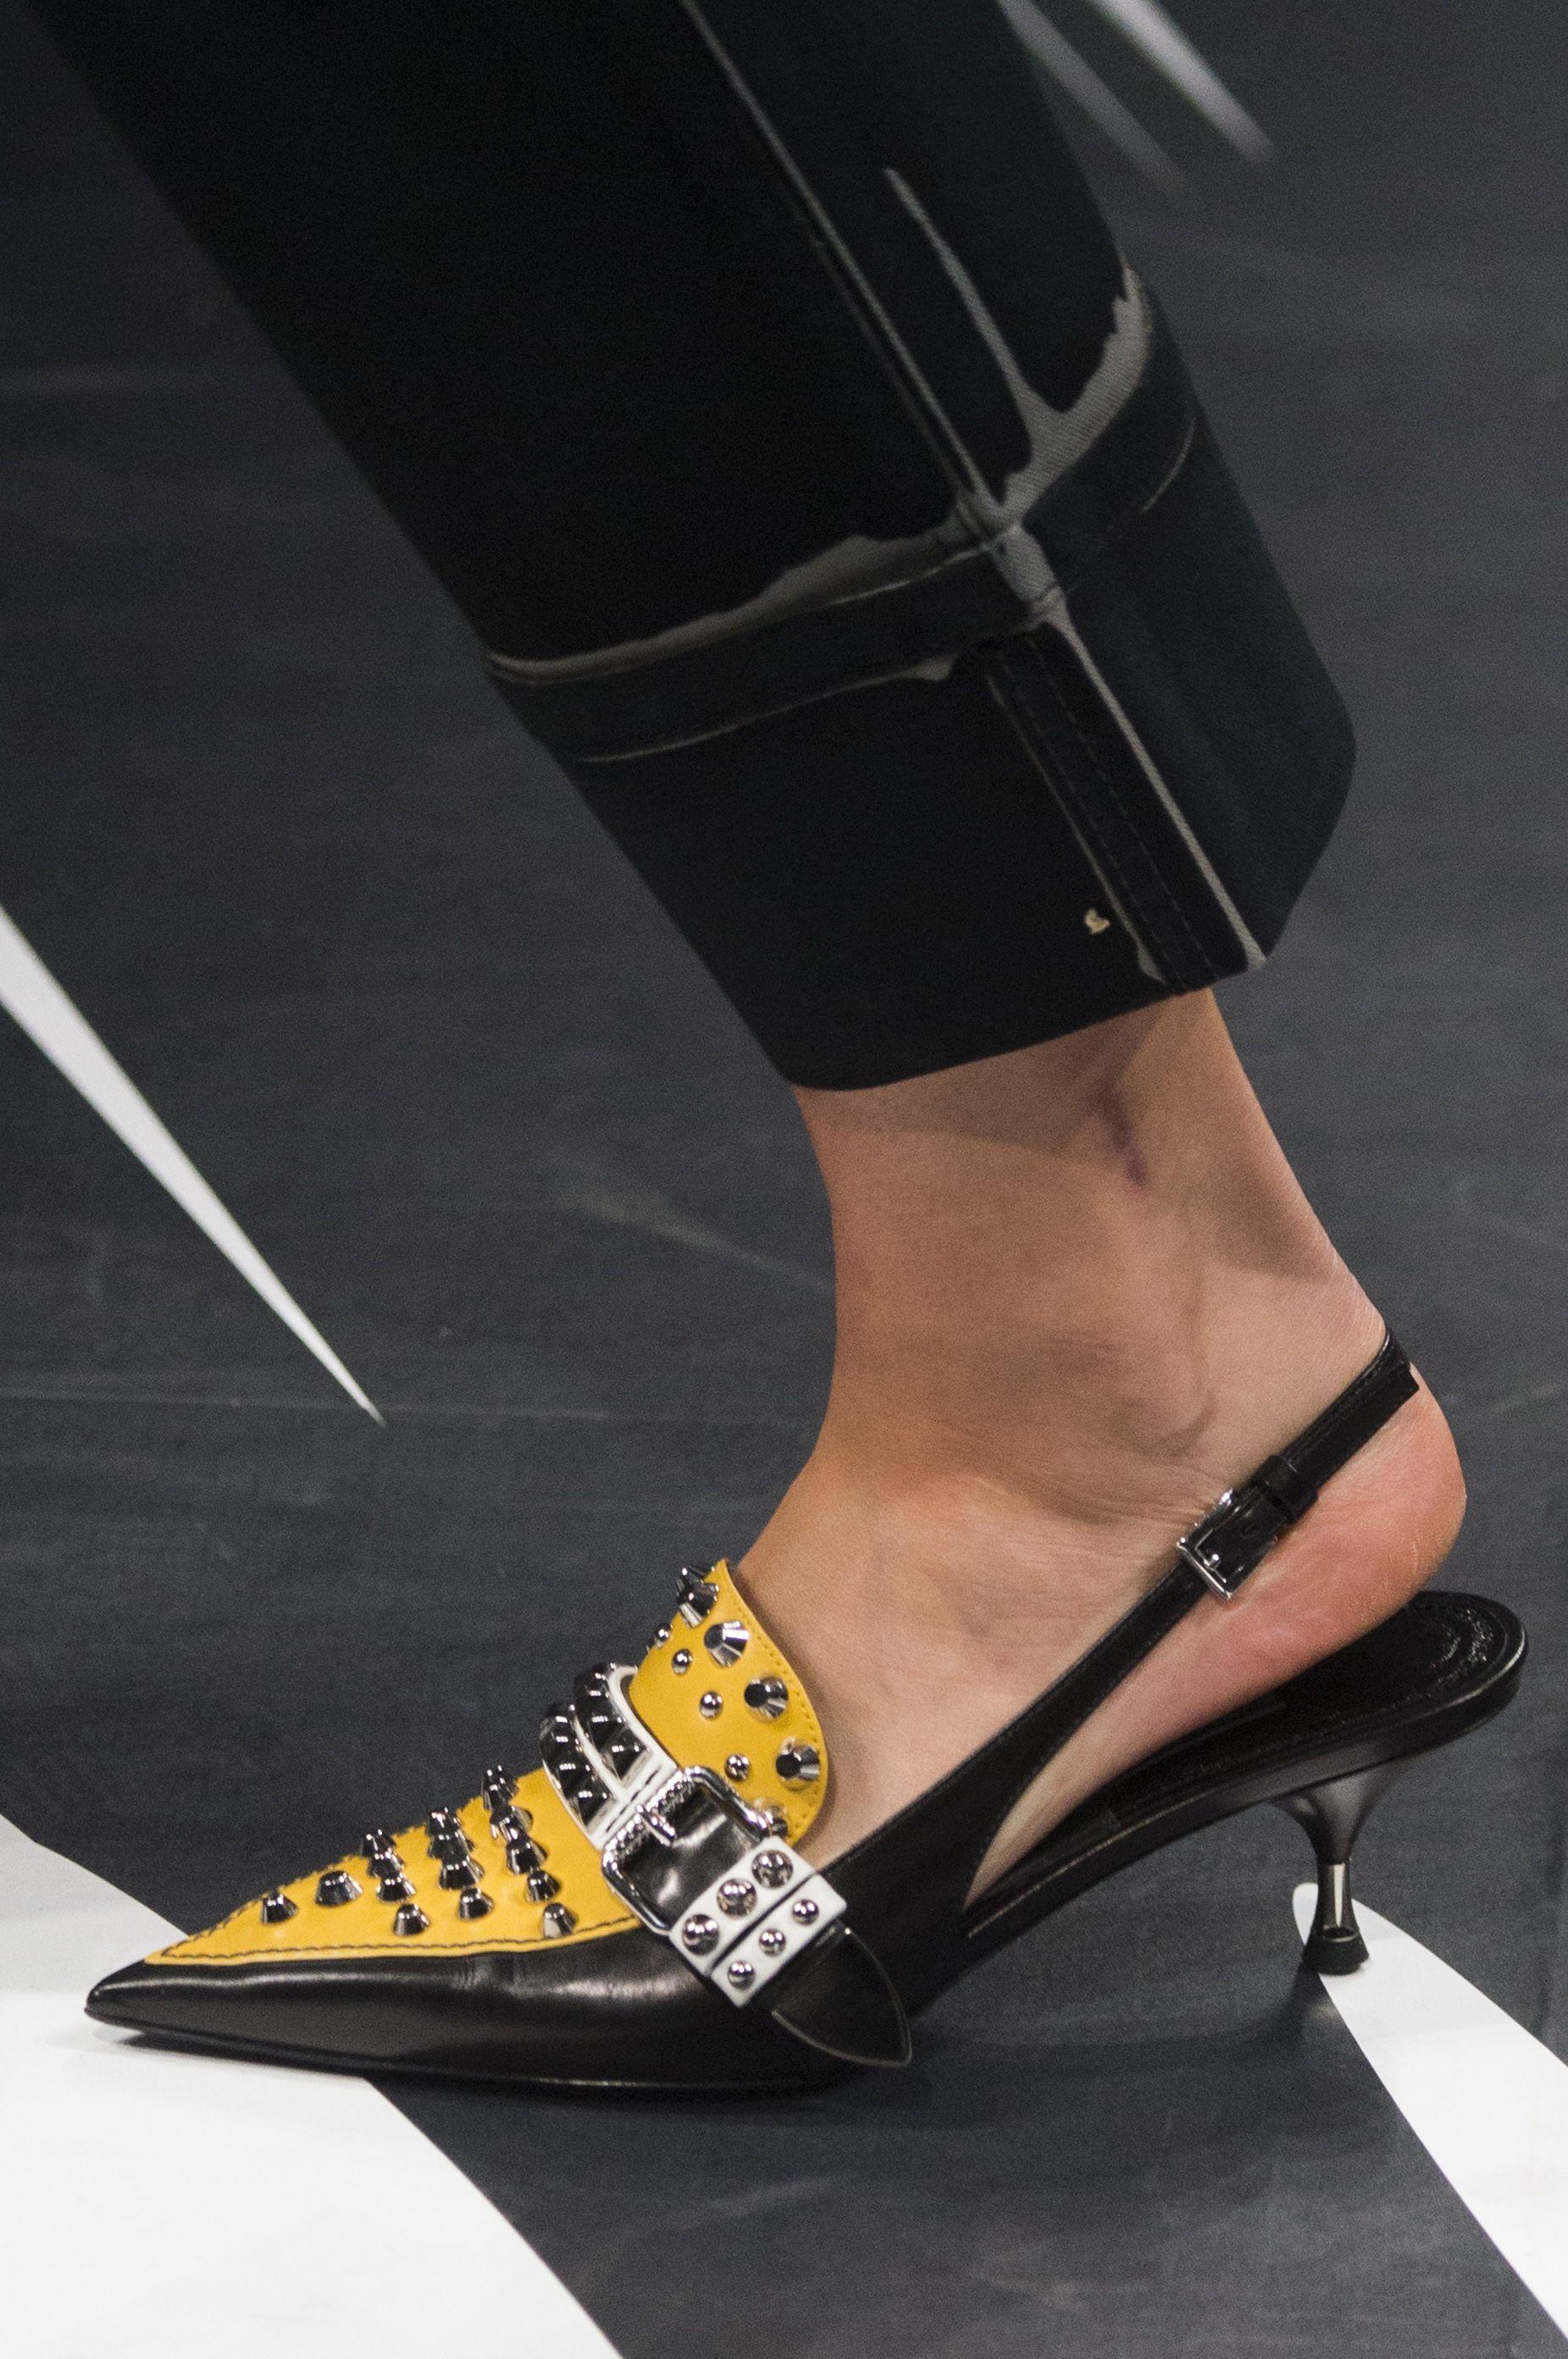 bf81352bbb0 Spring 2018 Shoe Trends - Shoe Runway Trends Spring 2018